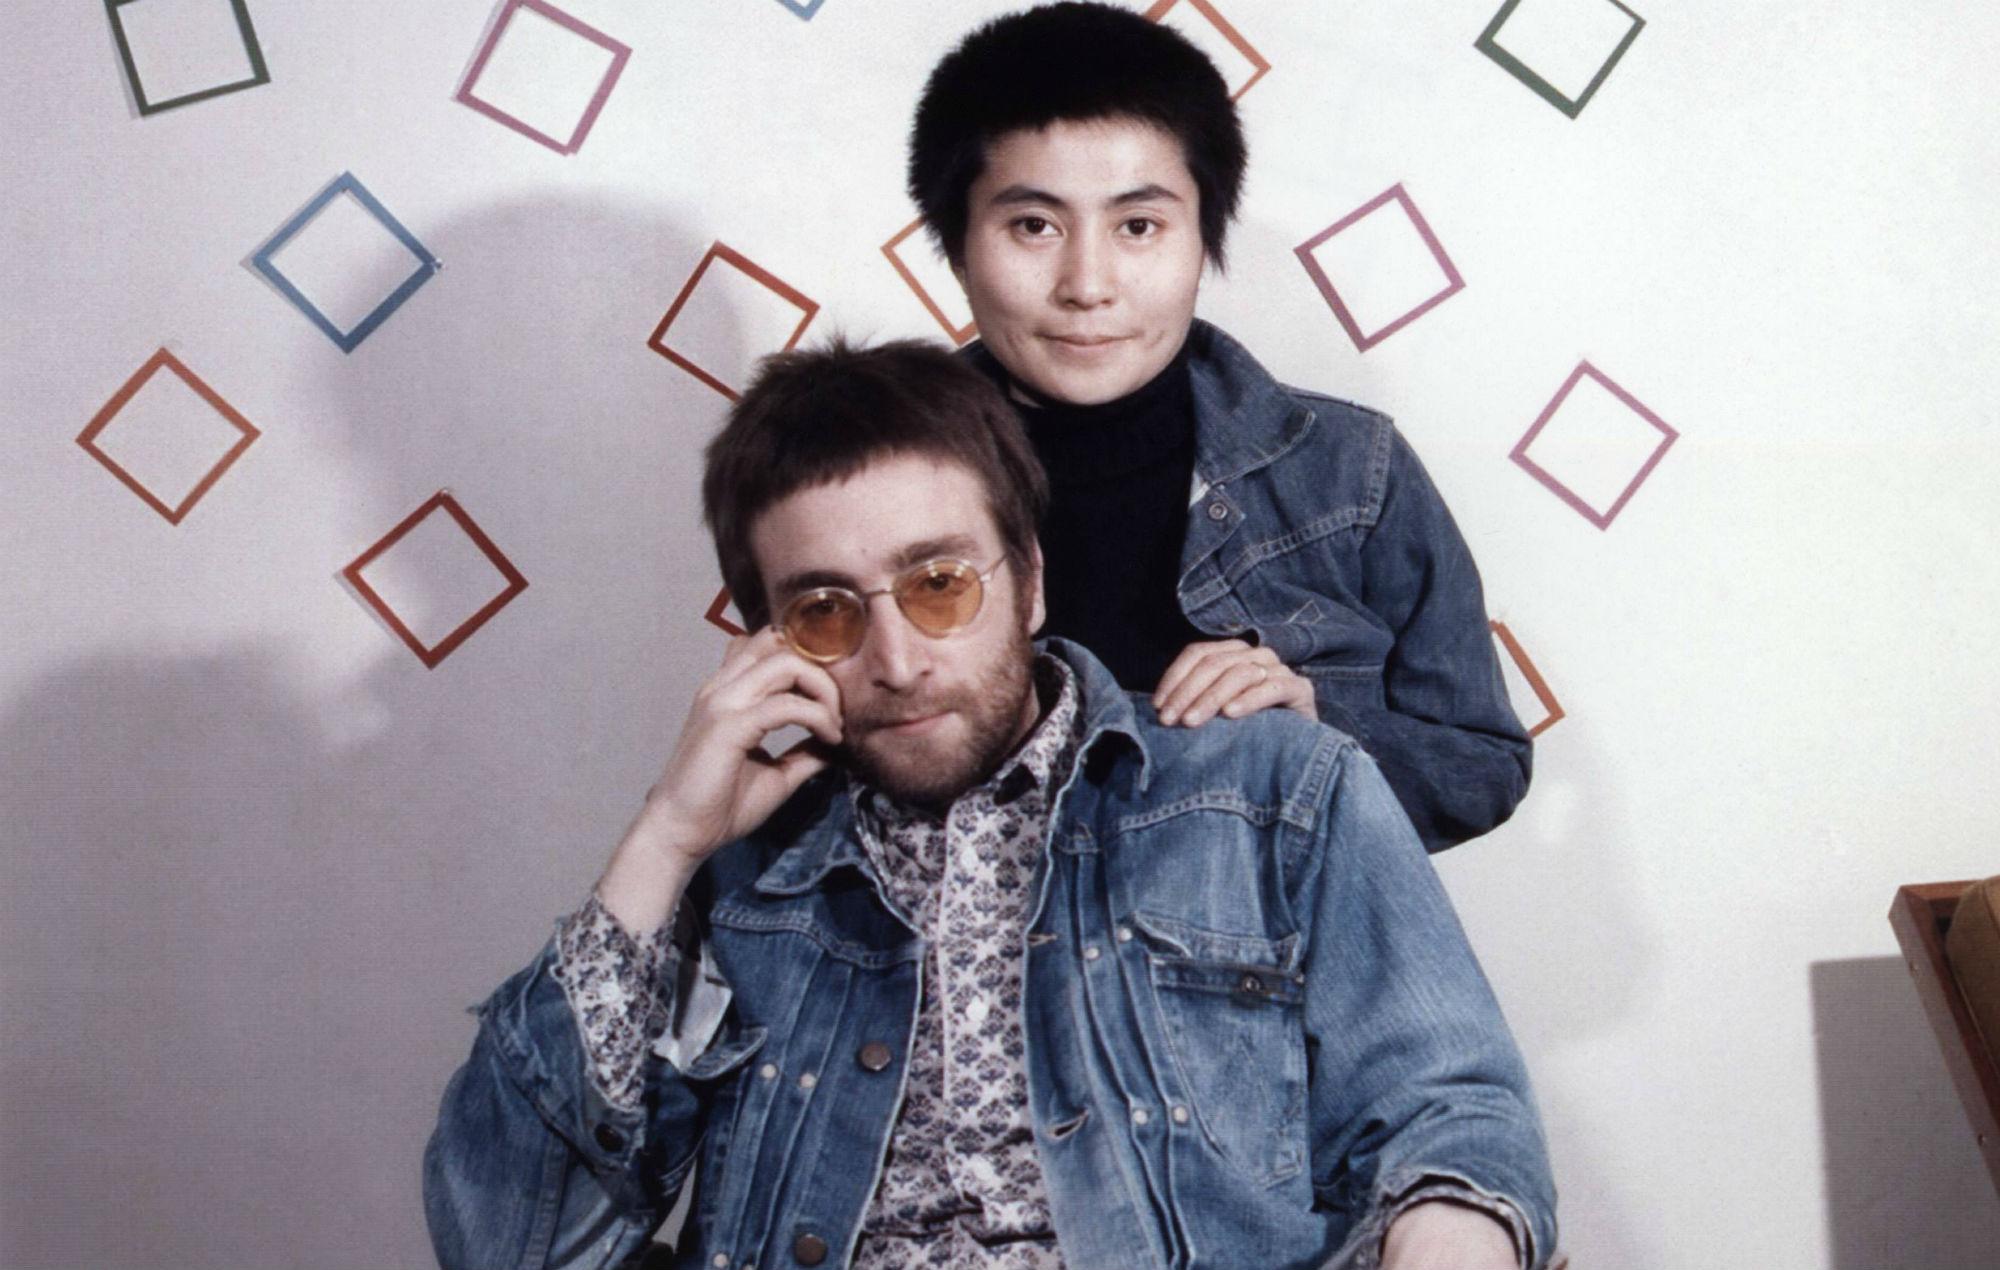 Never released John Lennon recording to be auctioned in Copenhagen